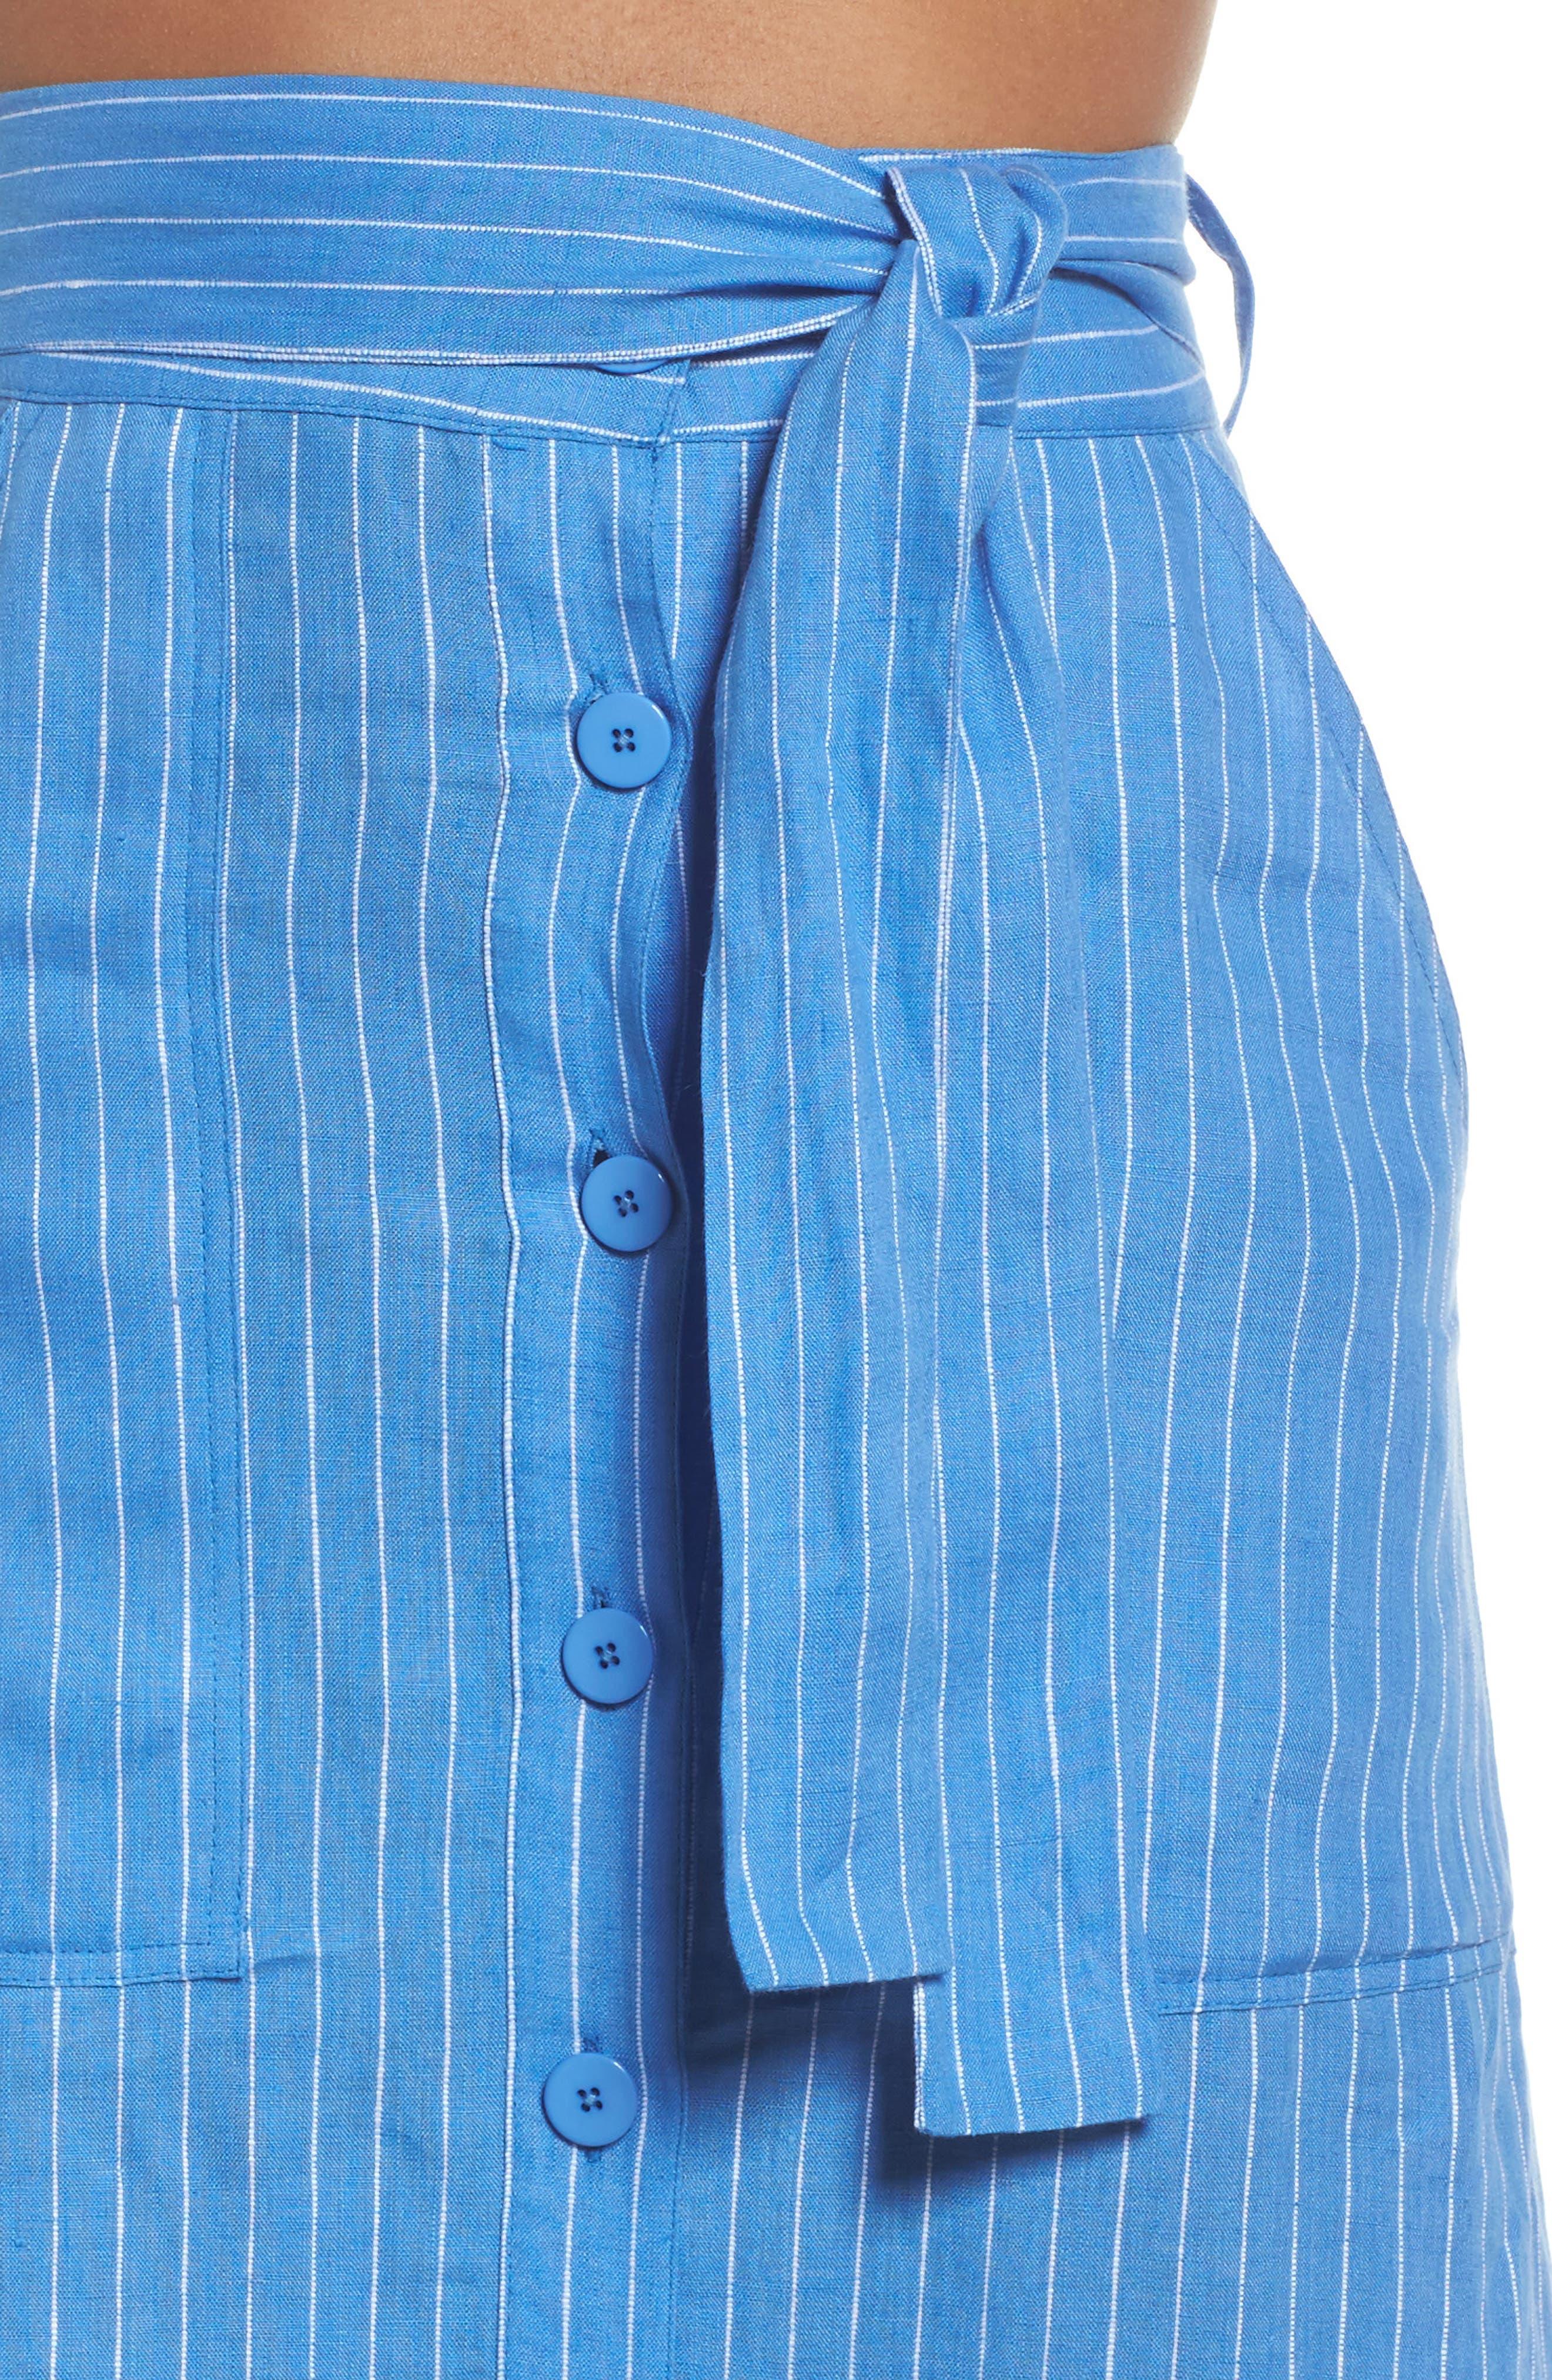 Cover-Up Skirt,                             Alternate thumbnail 4, color,                             Hydrangea/ Ivory